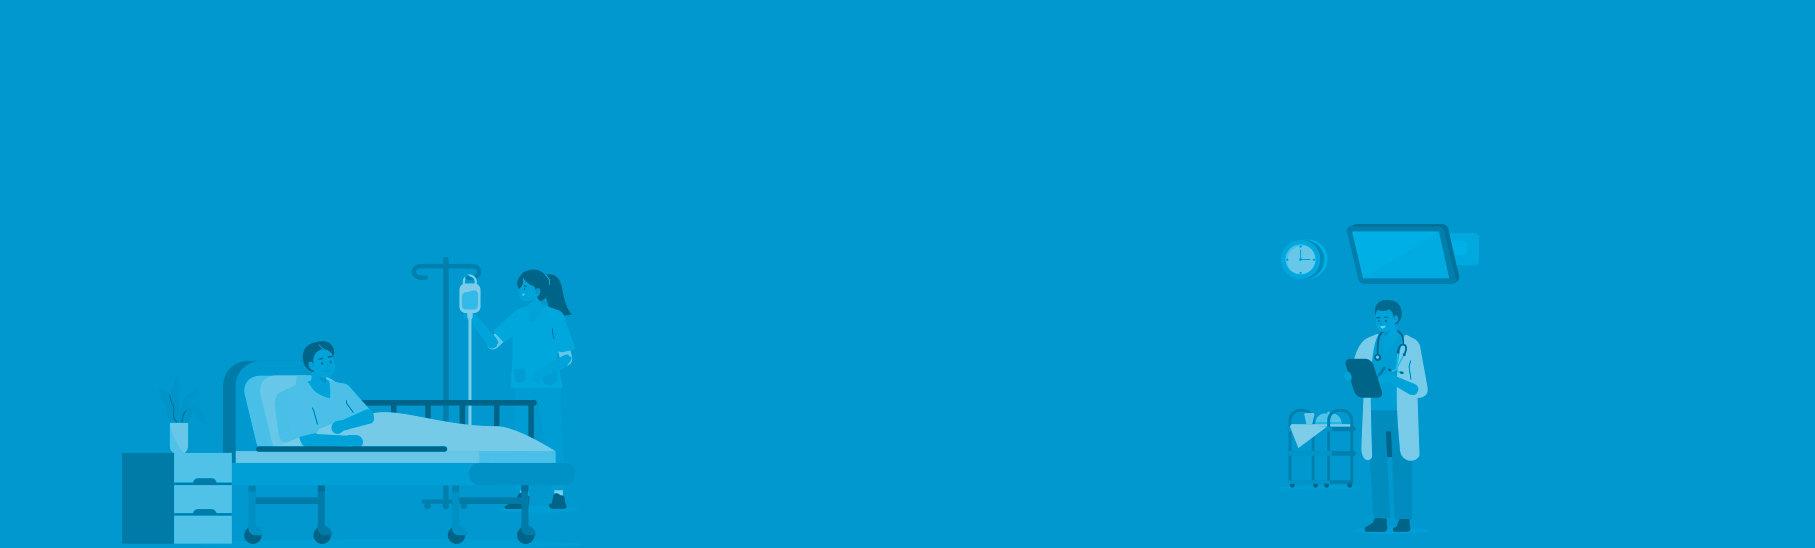 HOAT-New_design_1A_background.jpg